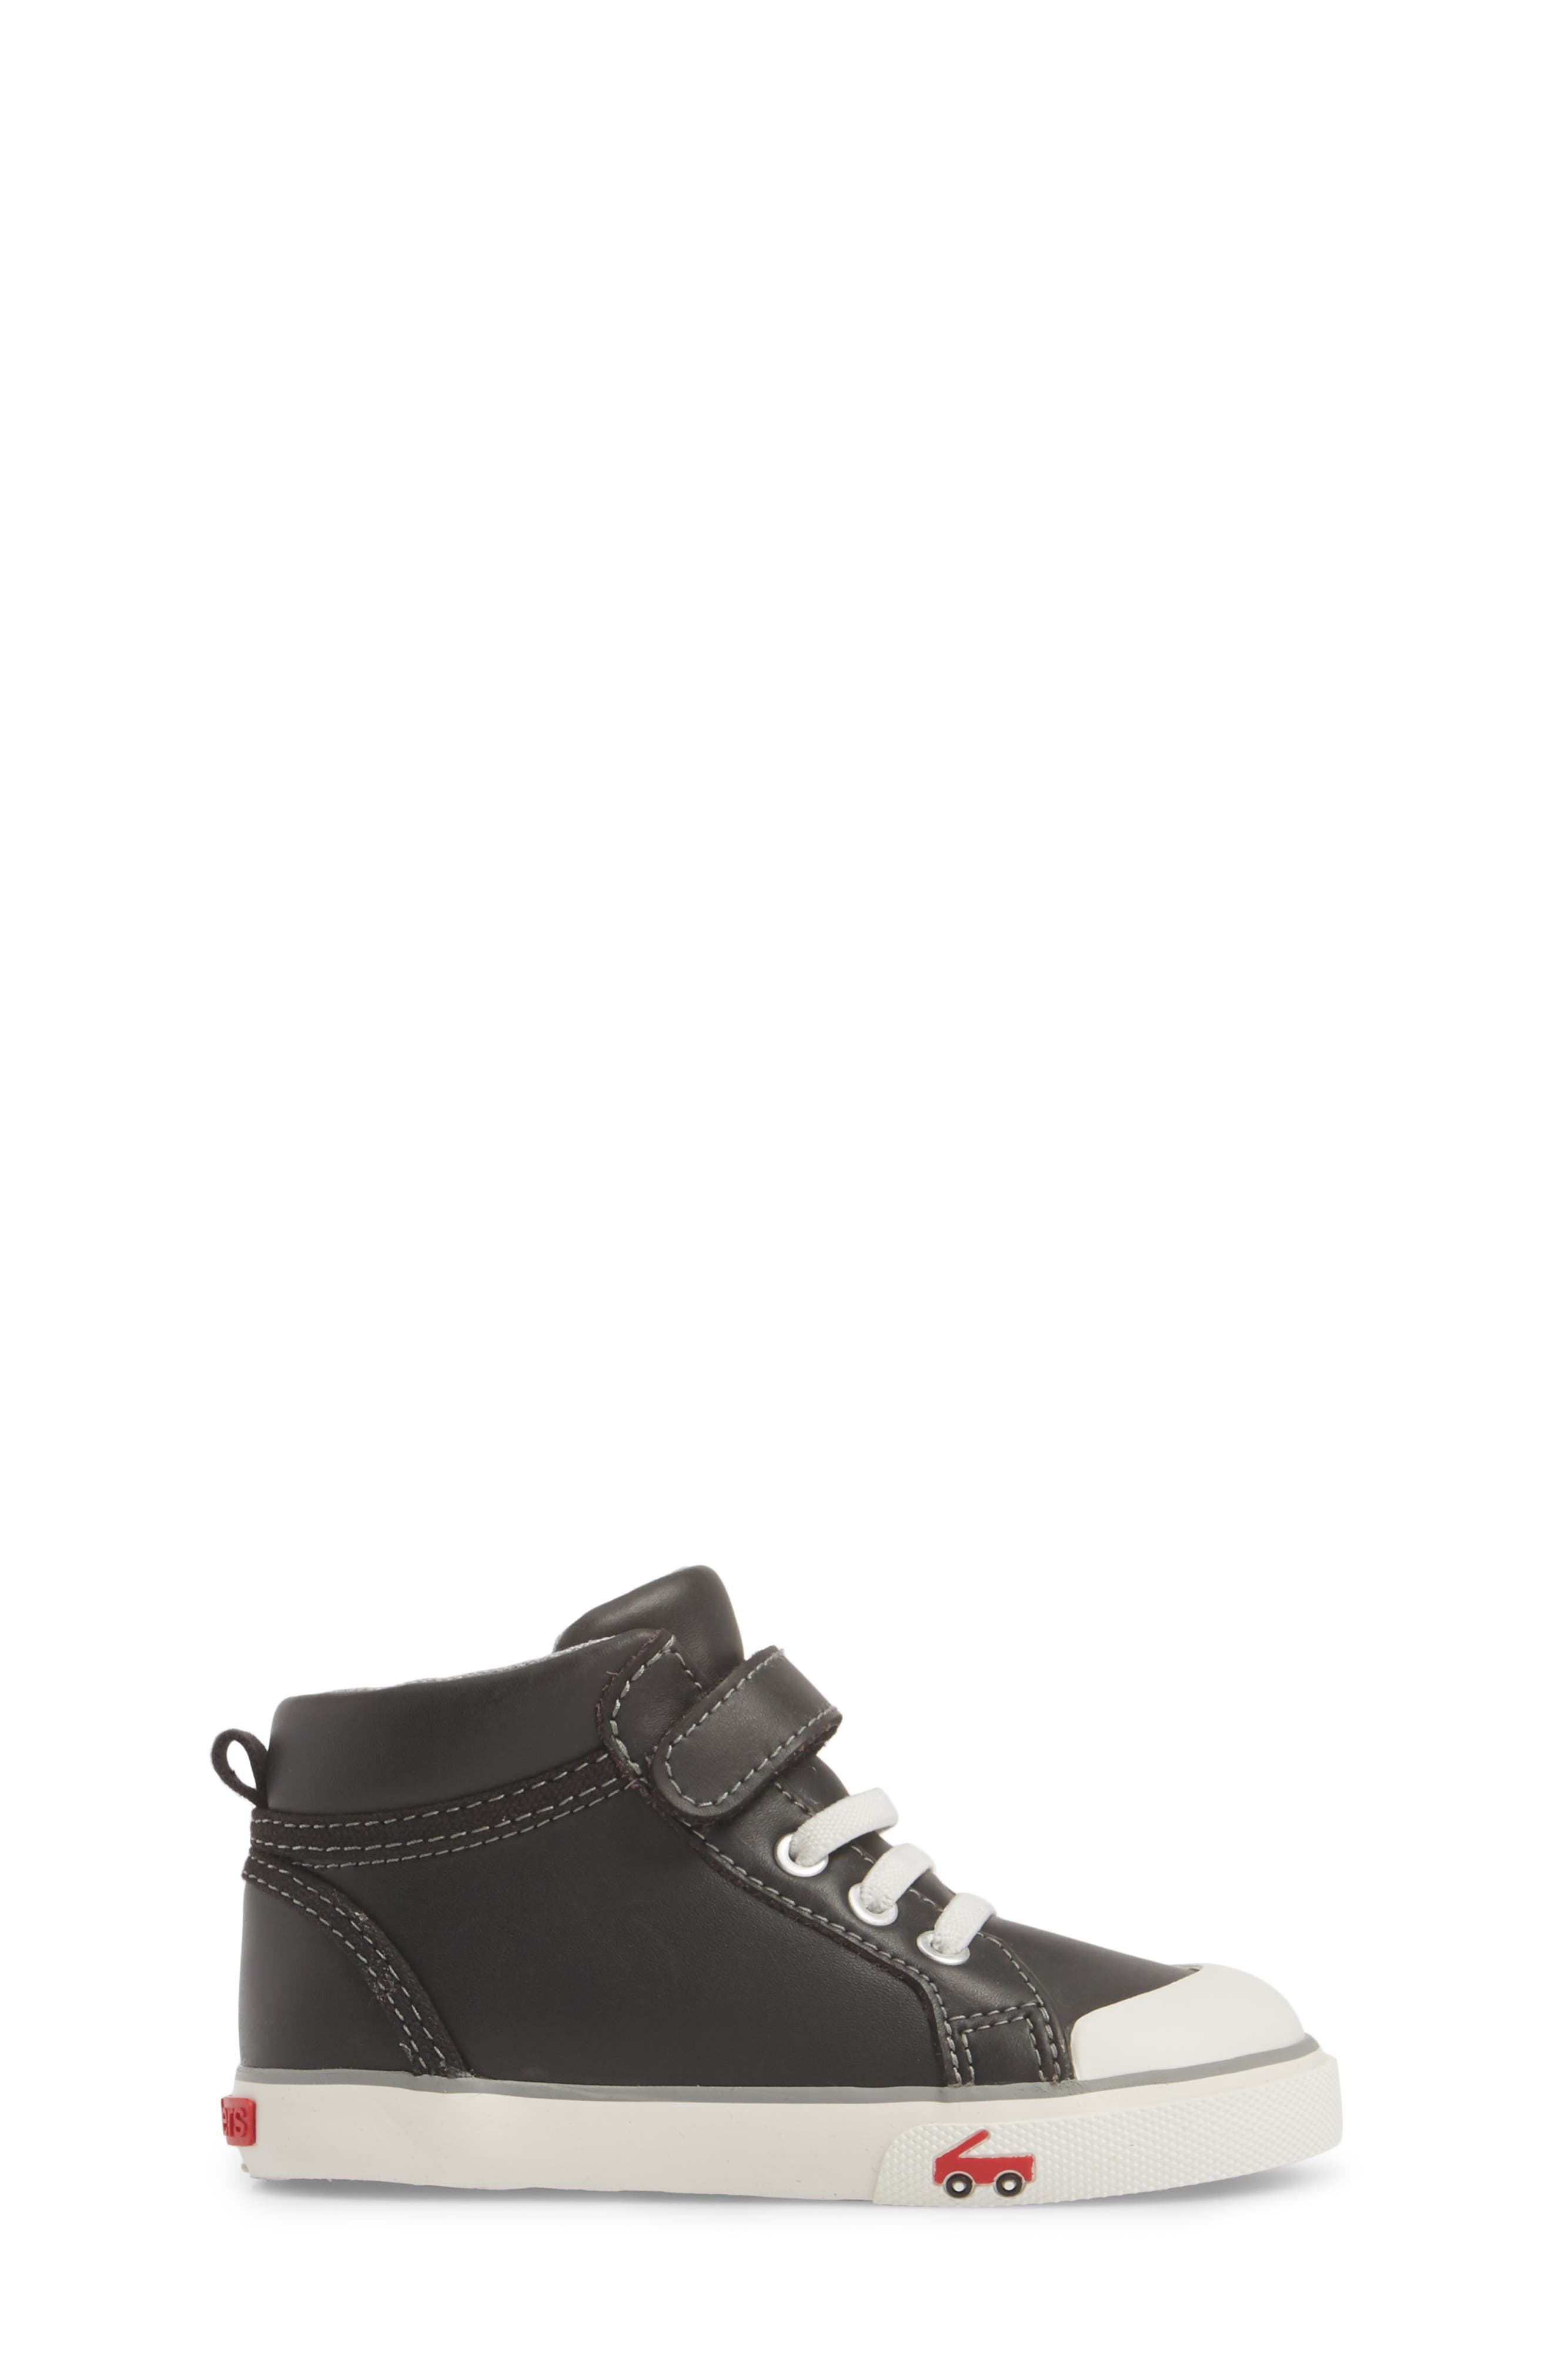 SEE KAI RUN, Peyton High Top Sneaker, Alternate thumbnail 3, color, BLACK LEATHER